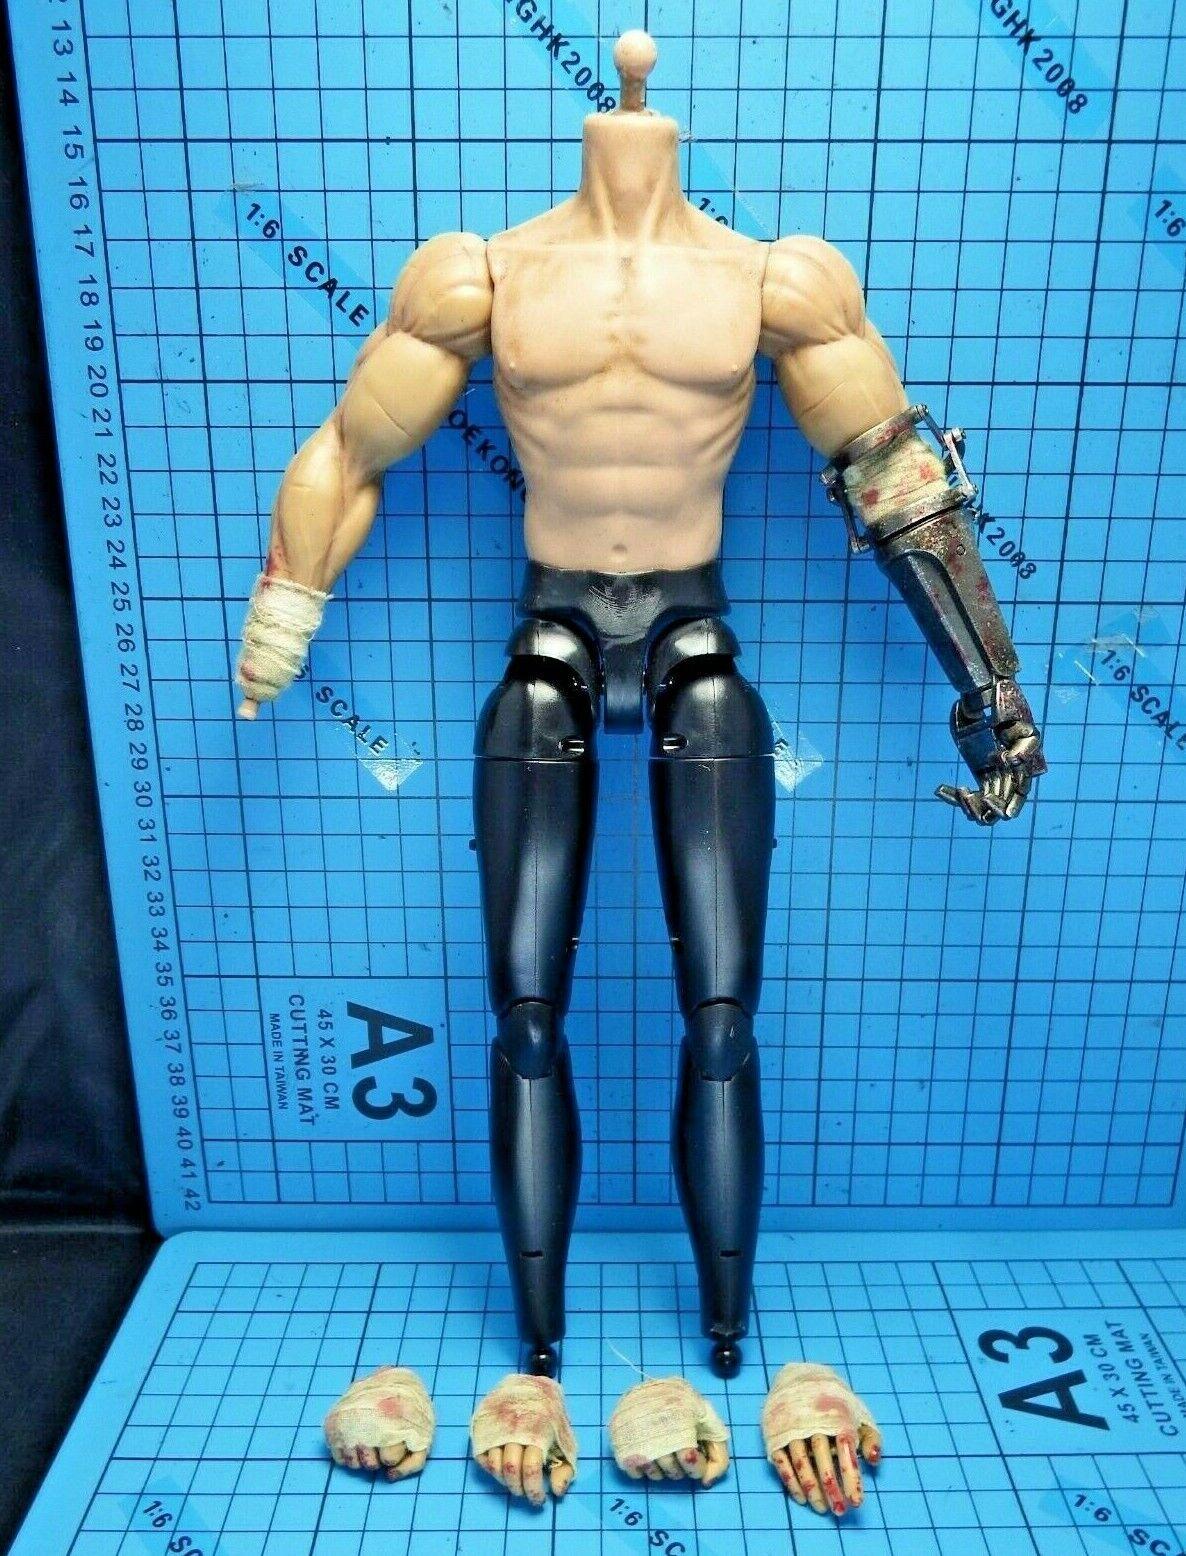 Threezero 1 6 Berserk agallas Figura-Cuerpo Muscular + Metal prótesis Izquierda antebrazo